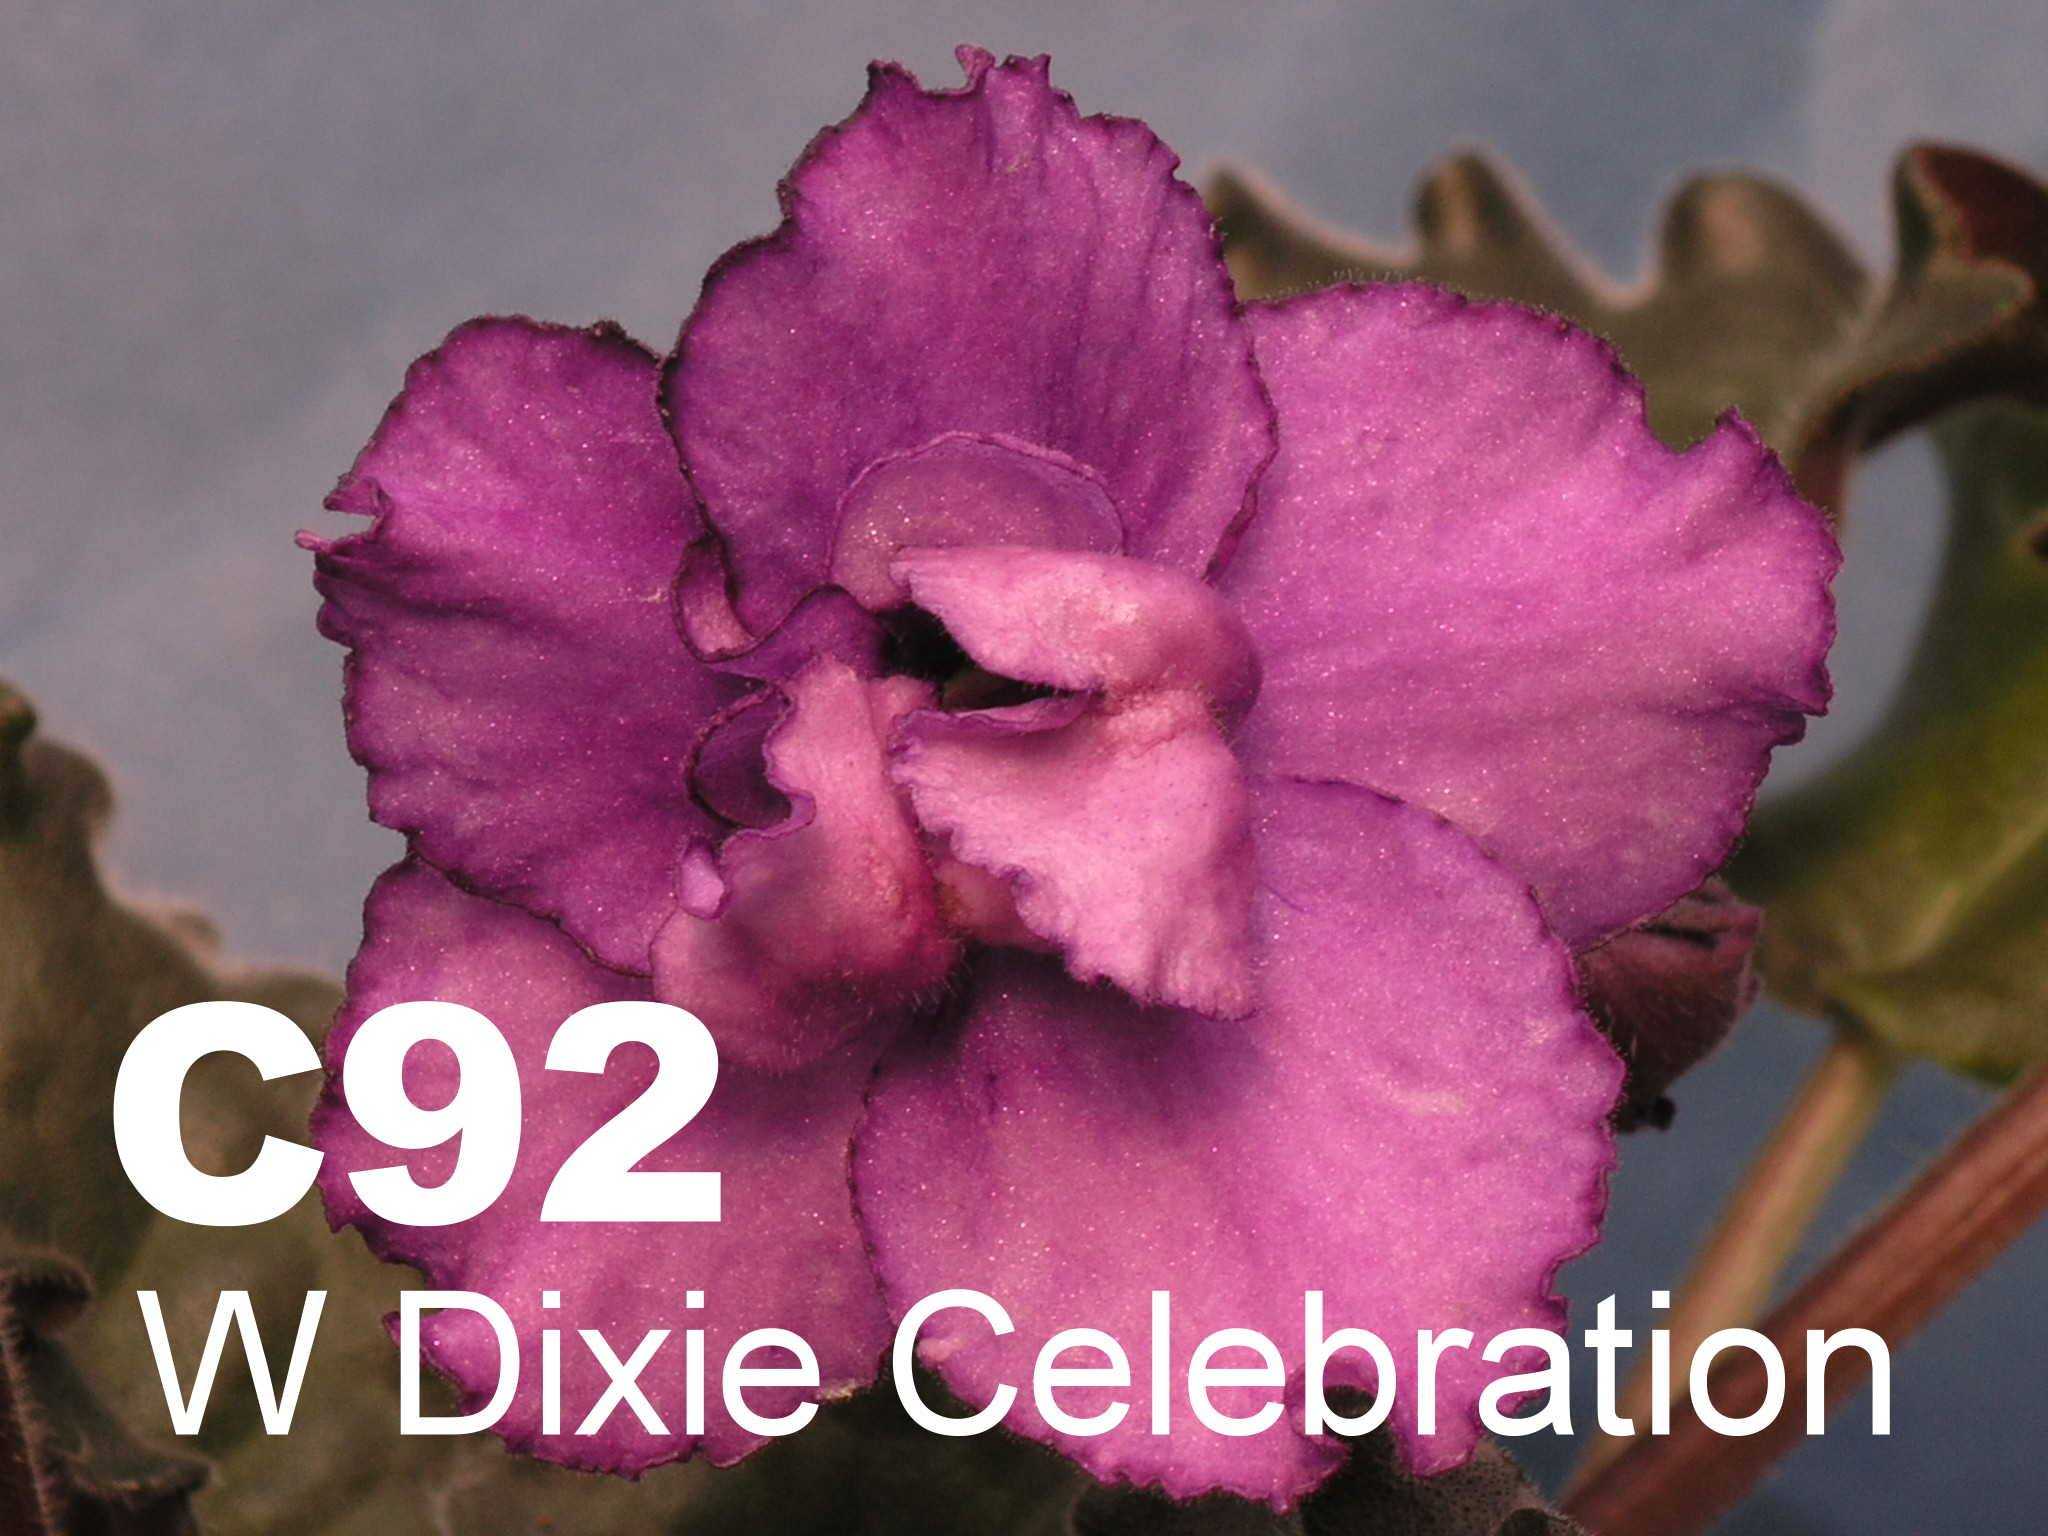 [C92] Wrangler's Dixie Celebration C92